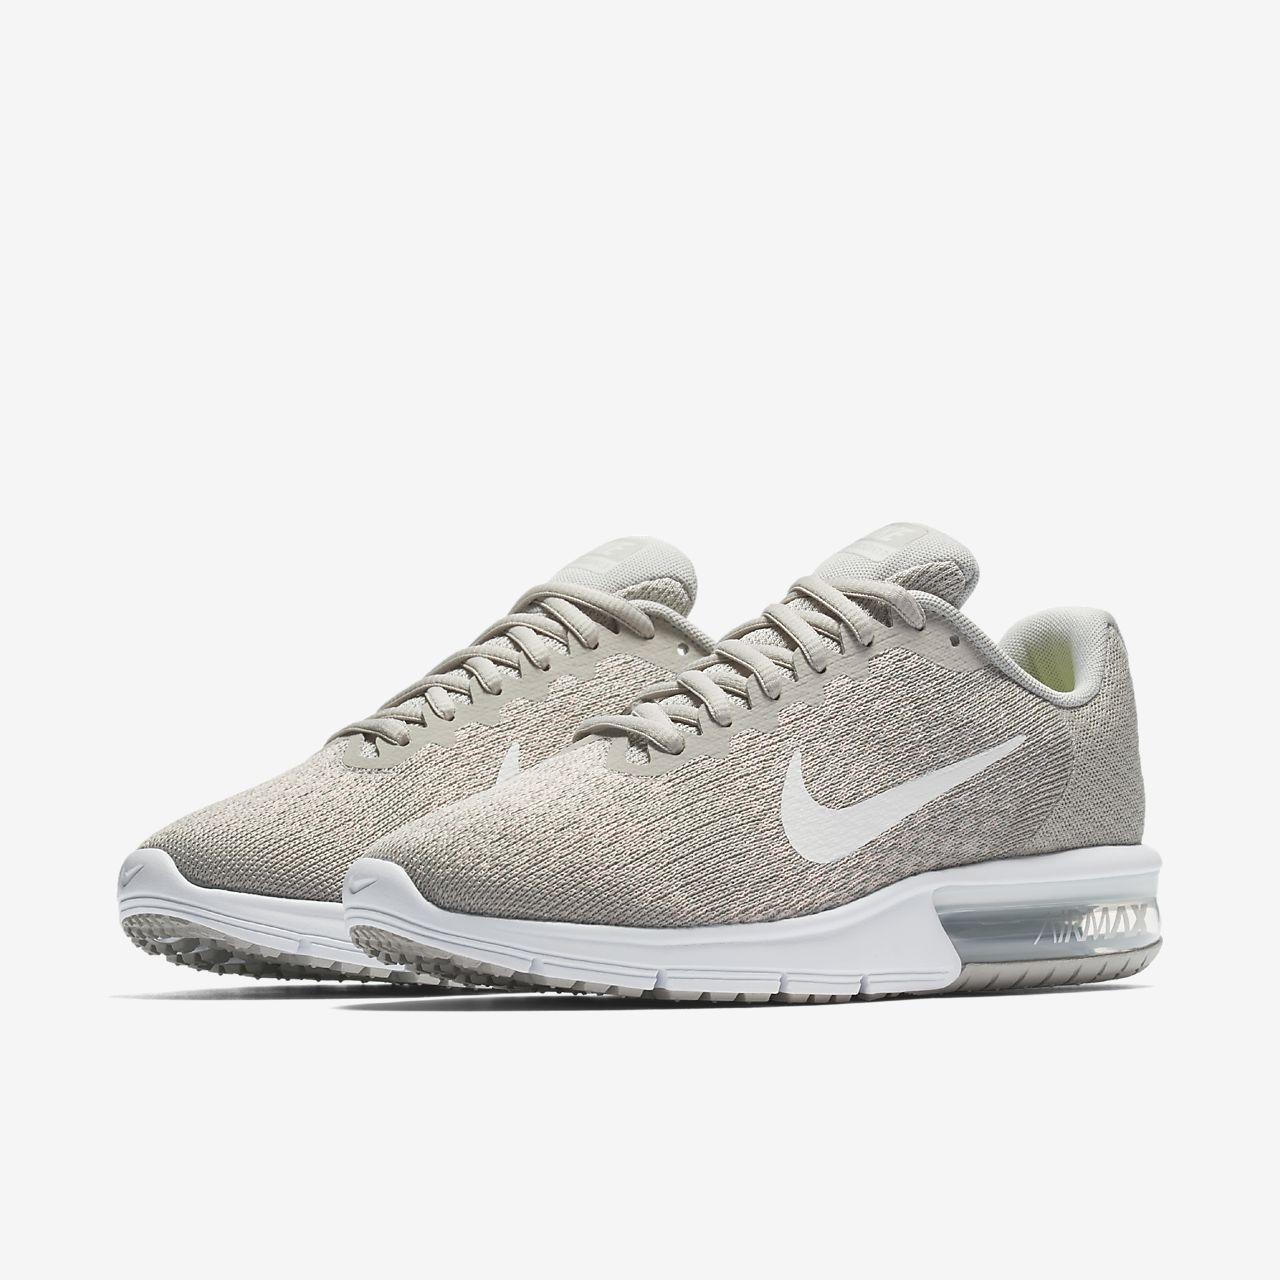 Nike Air Max Sequent 2 852465 013